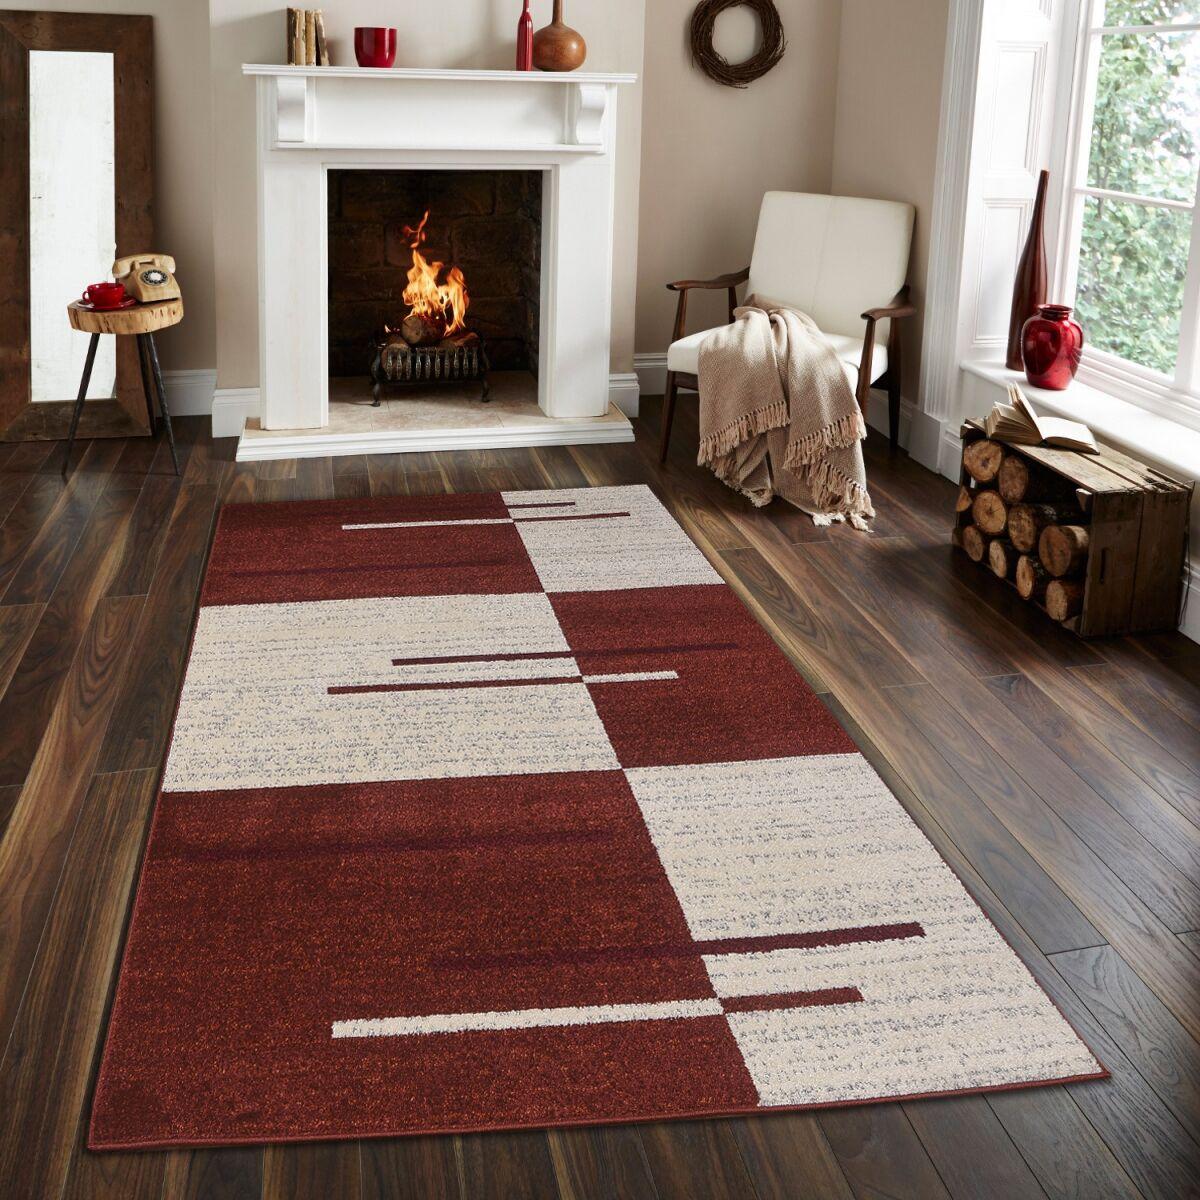 Swinehart Red/Beige Area Rug Rug Size: Rectangle 5' x 7'